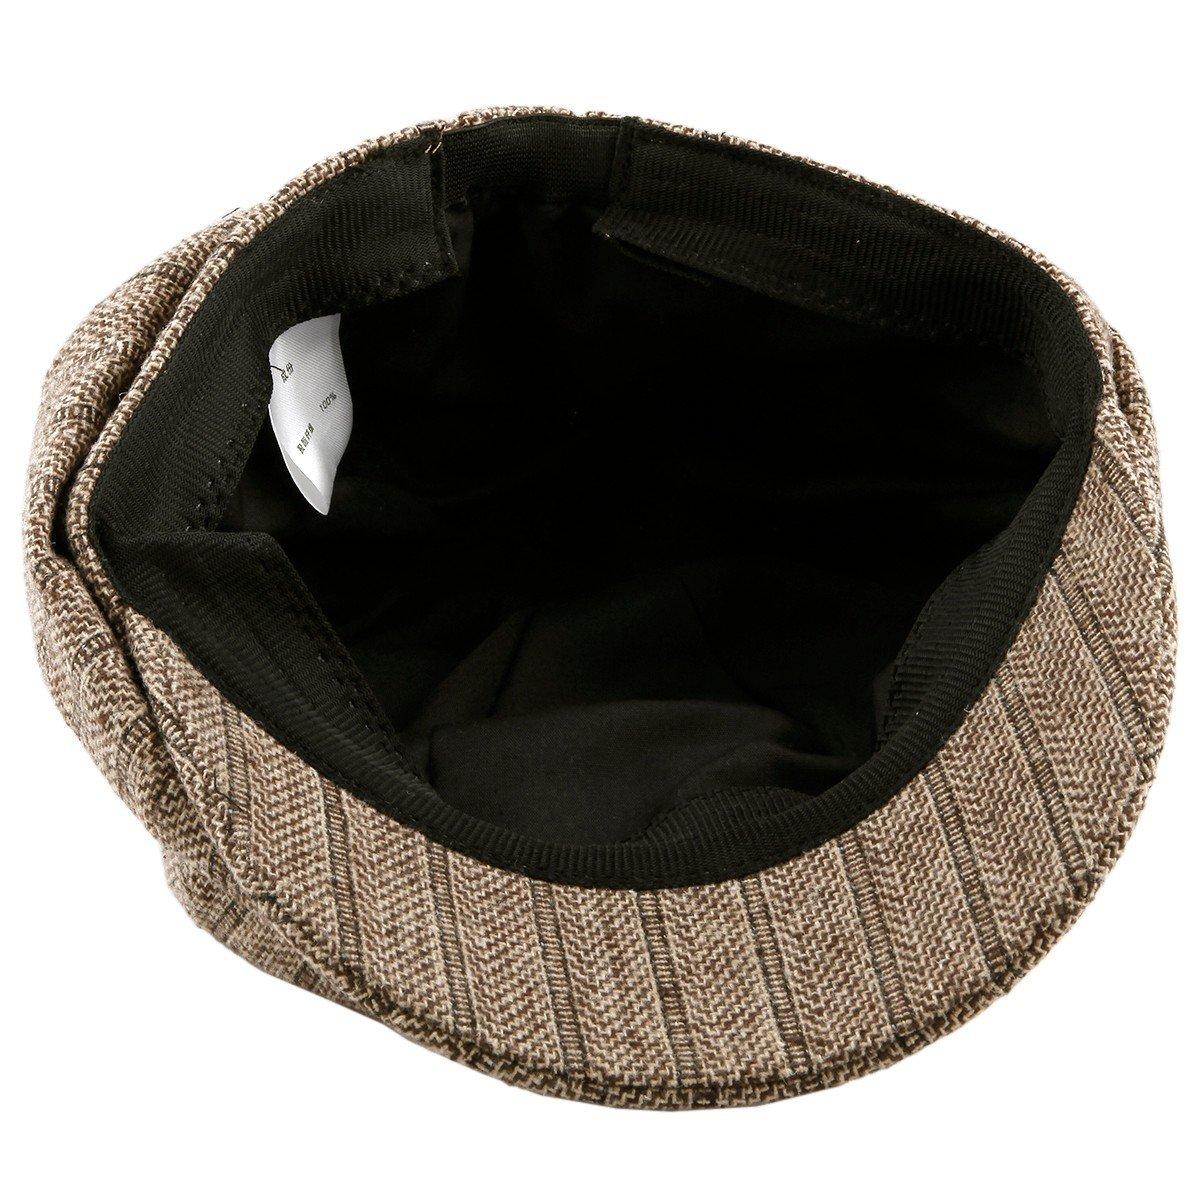 Moonsix Newsboys Hats,Unisex Winter Berets Hat Woolen Cotton Cabbie Cap 2